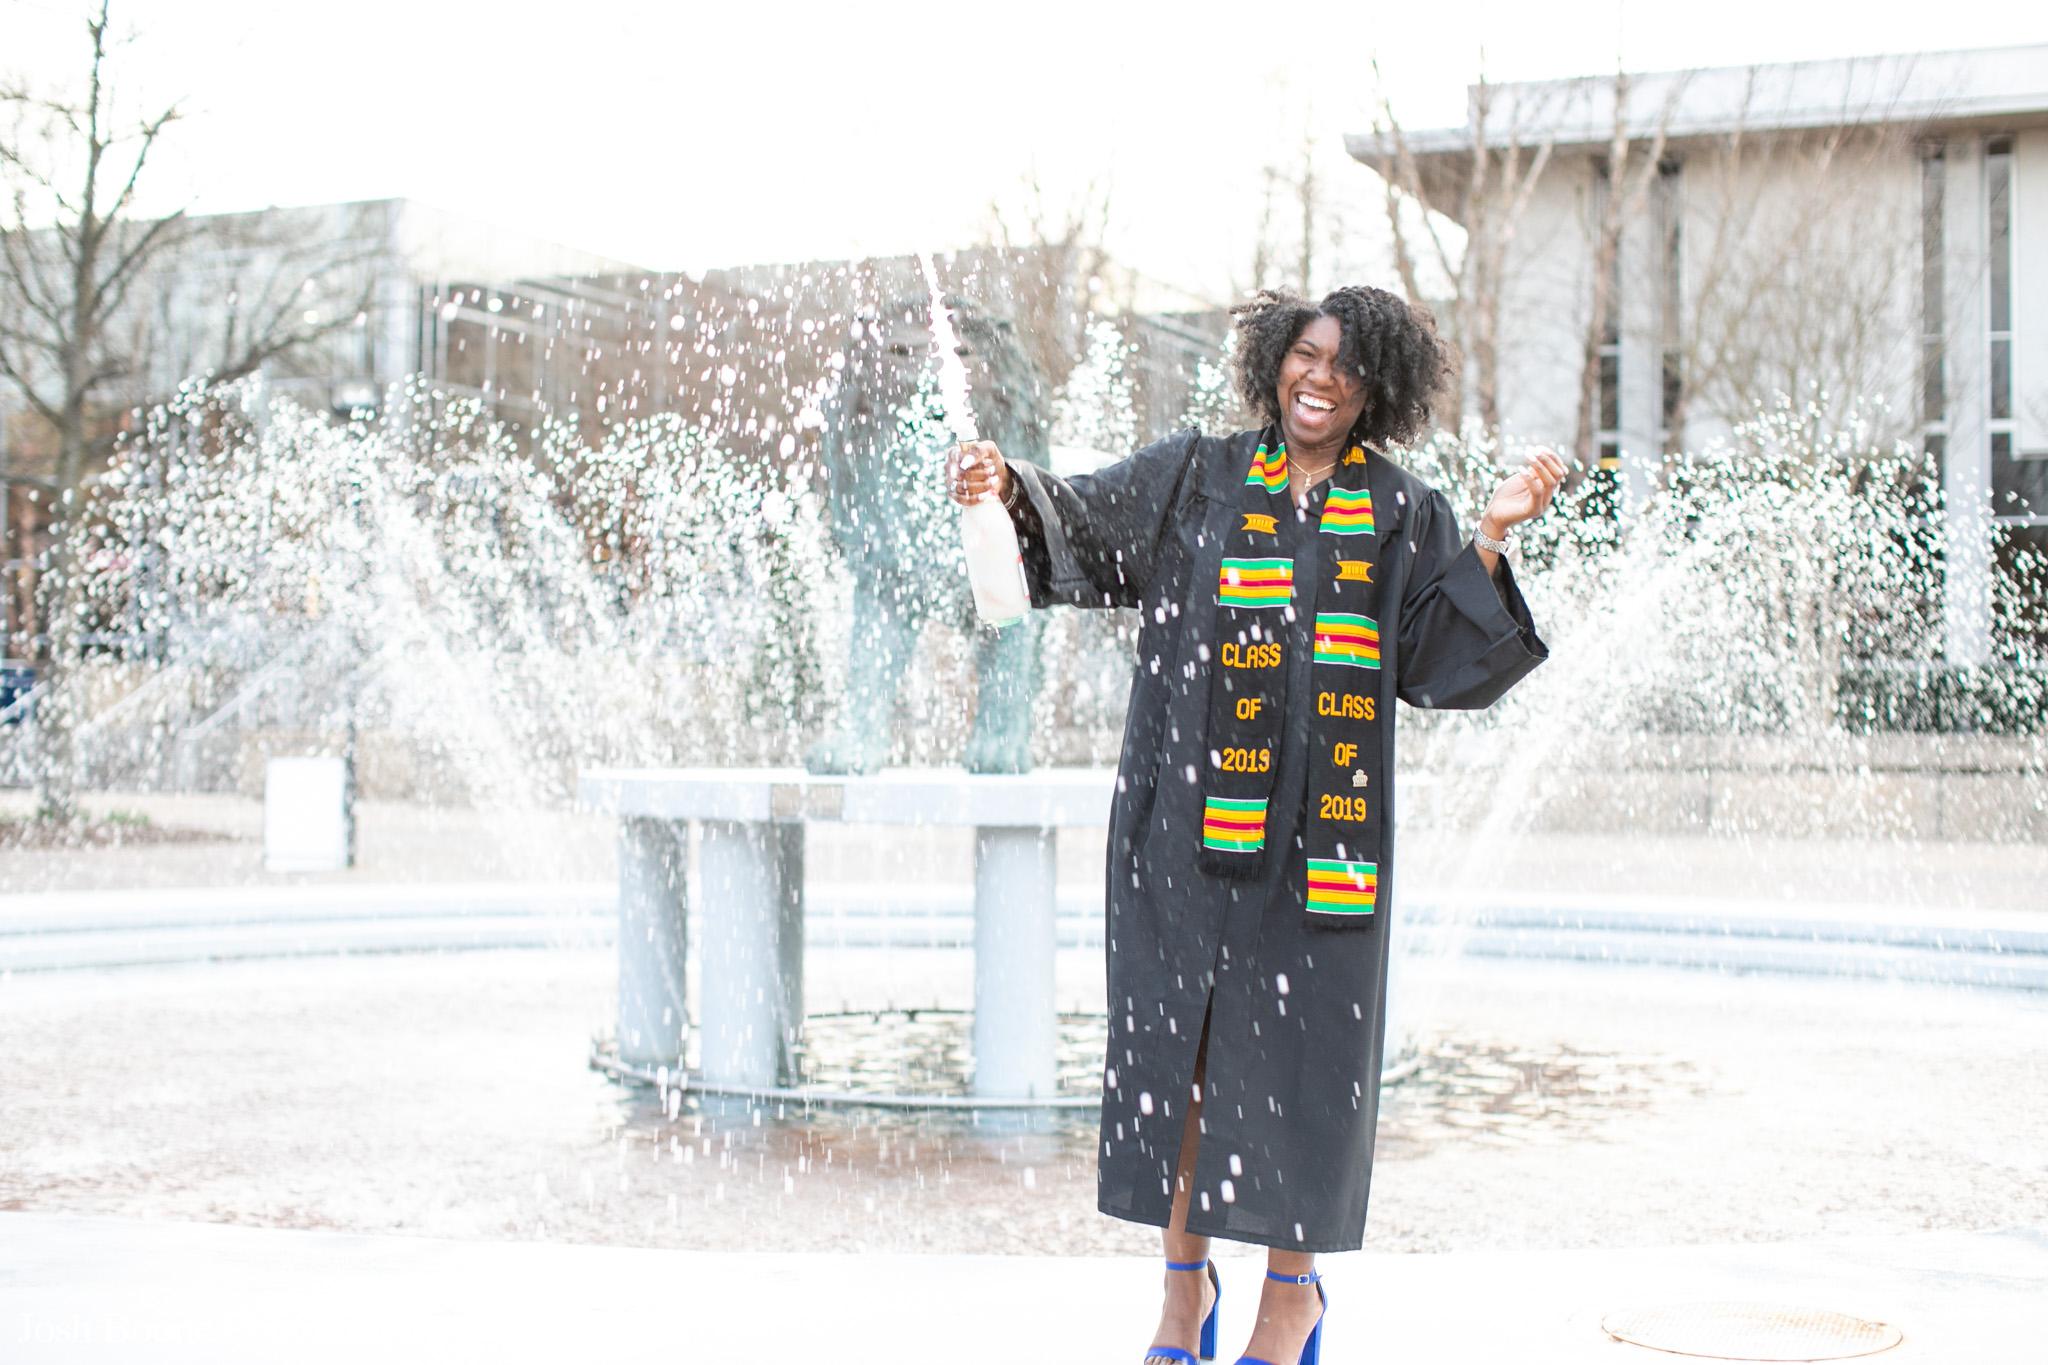 old_dominion_university_graduation_pictures-10.jpg